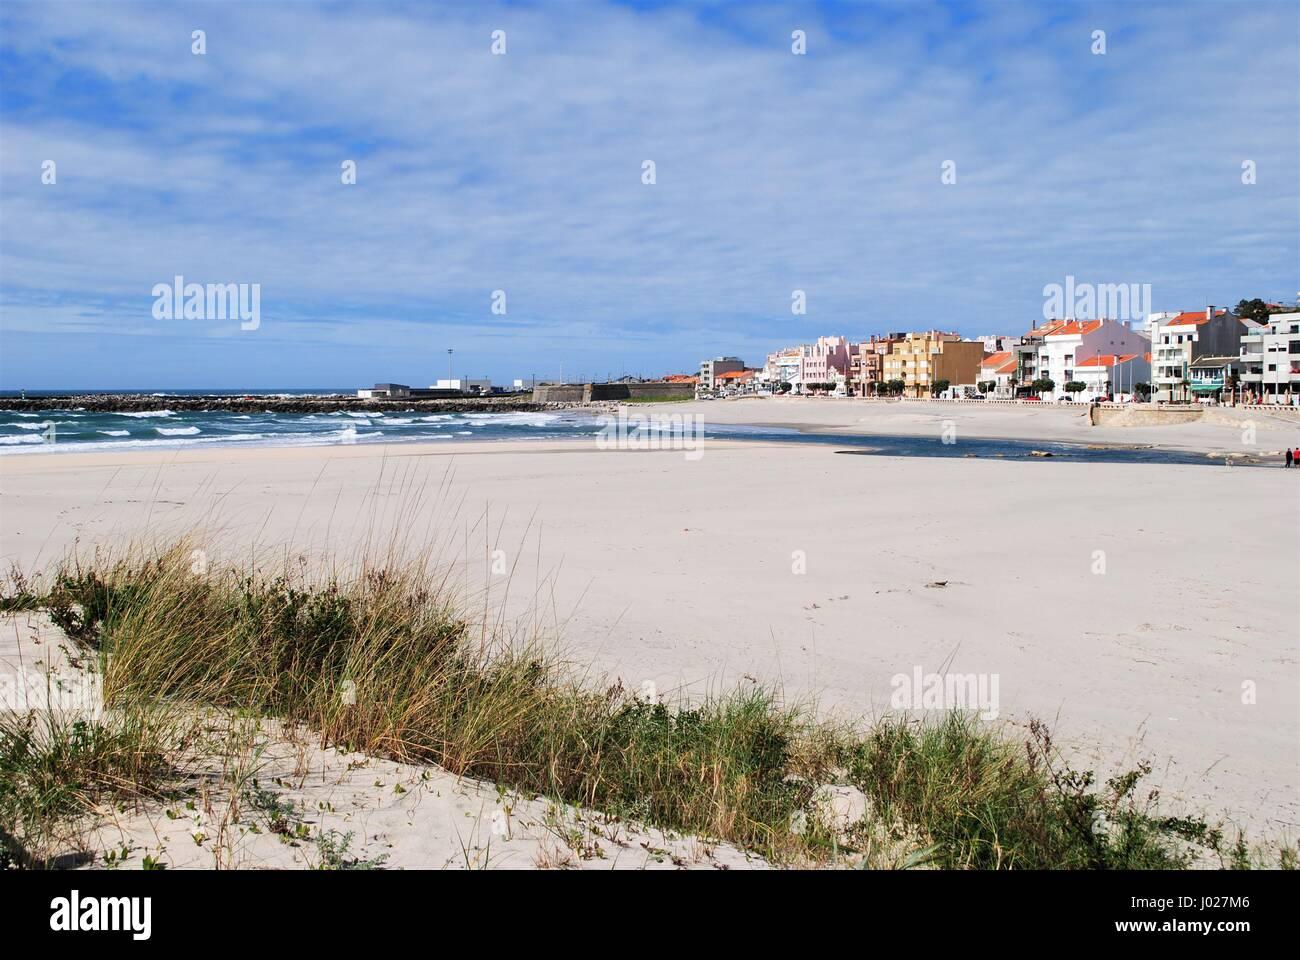 Vila Praia de Âncora, Portugal city - Stock Image